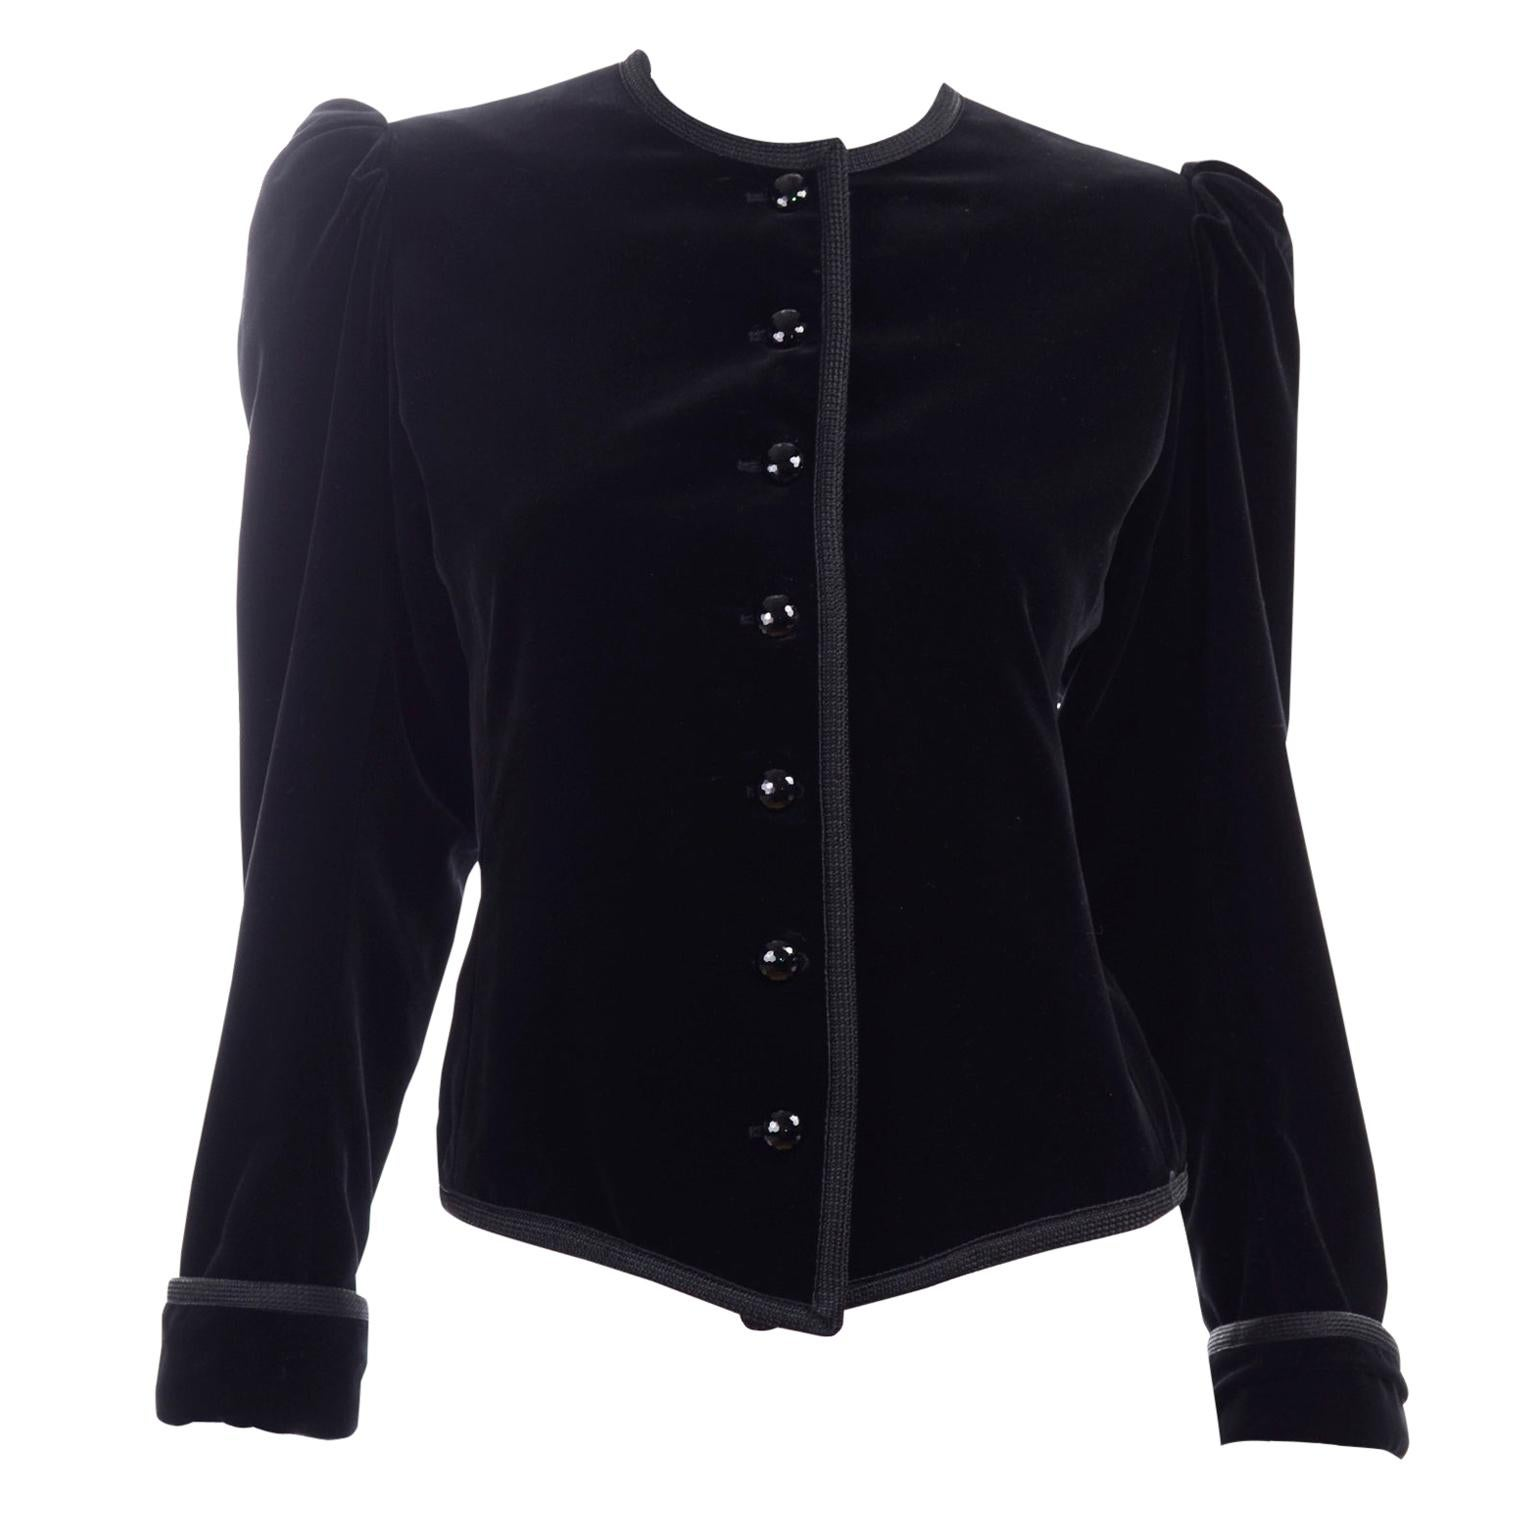 1970s Yves Saint Laurent Vintage Black Velvet Russian Jacket w Braid Trim